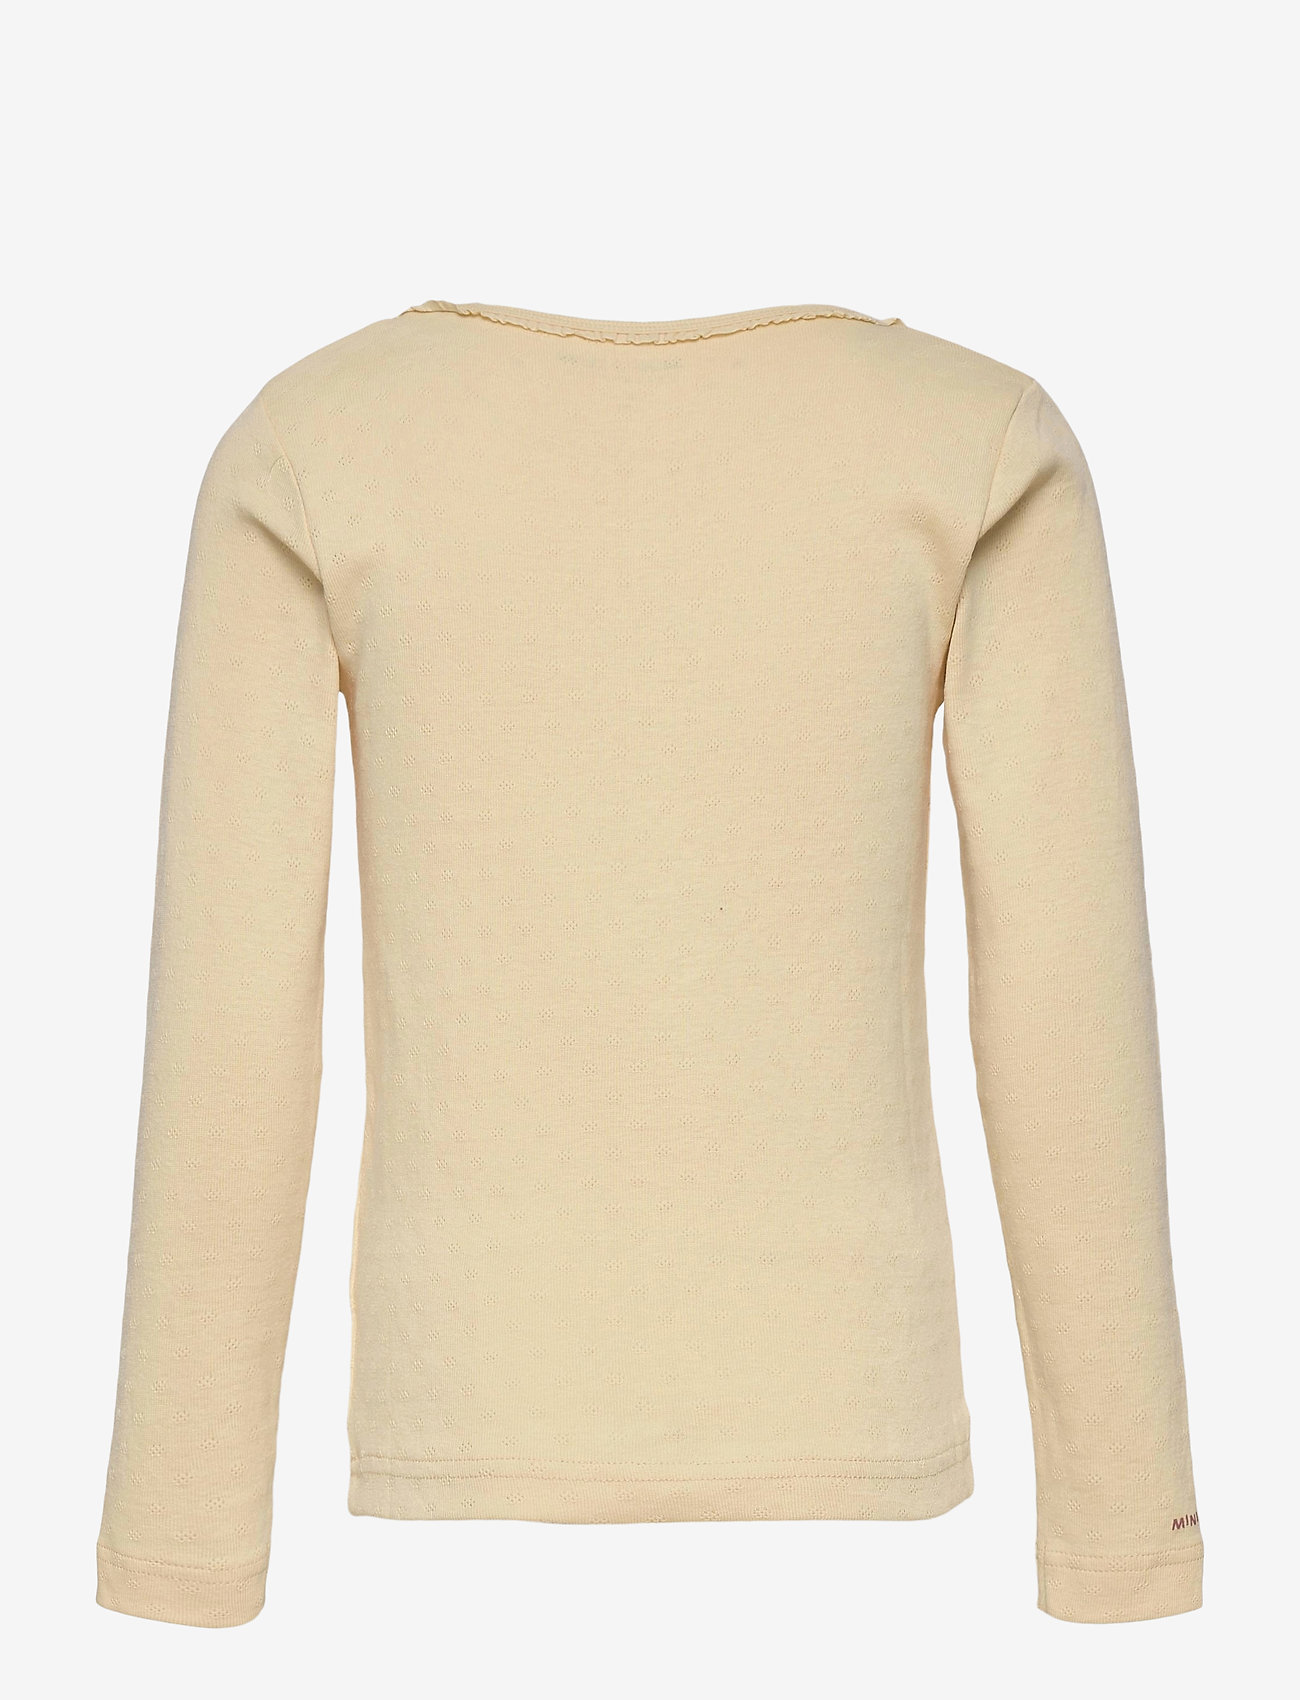 Mini A Ture - Aje T-shirt GOTS, K - long-sleeved - apricot gelato - 1